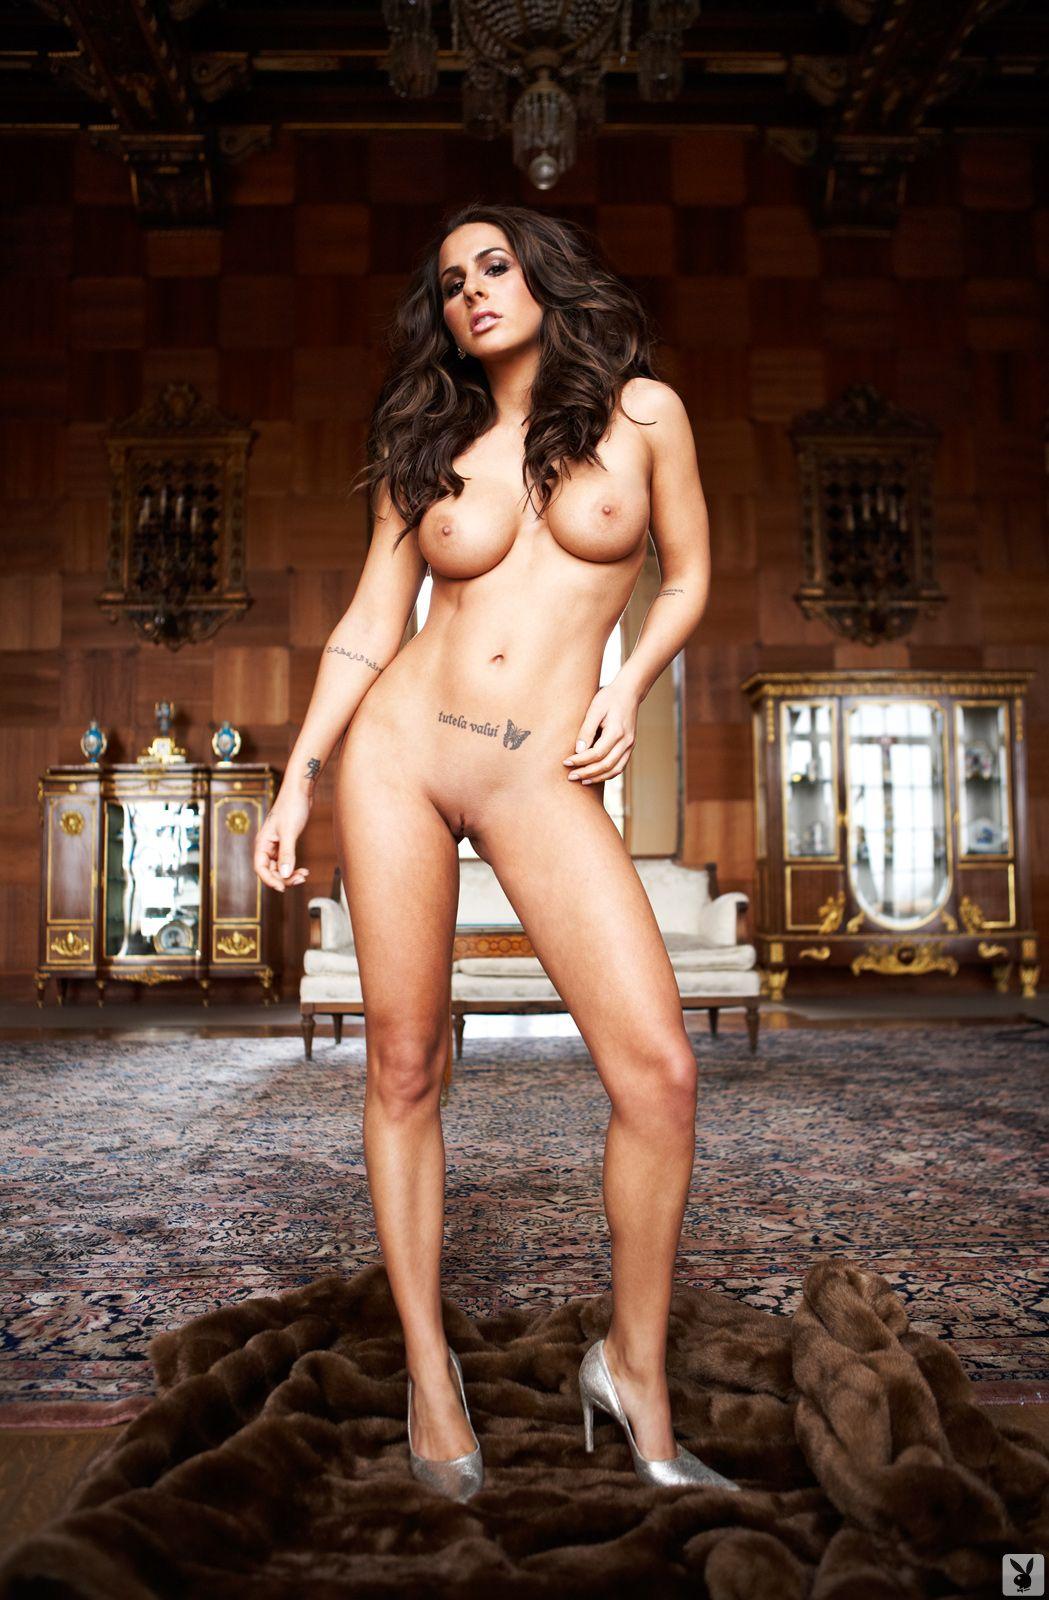 Updog reccomend Ashley dupre naked video